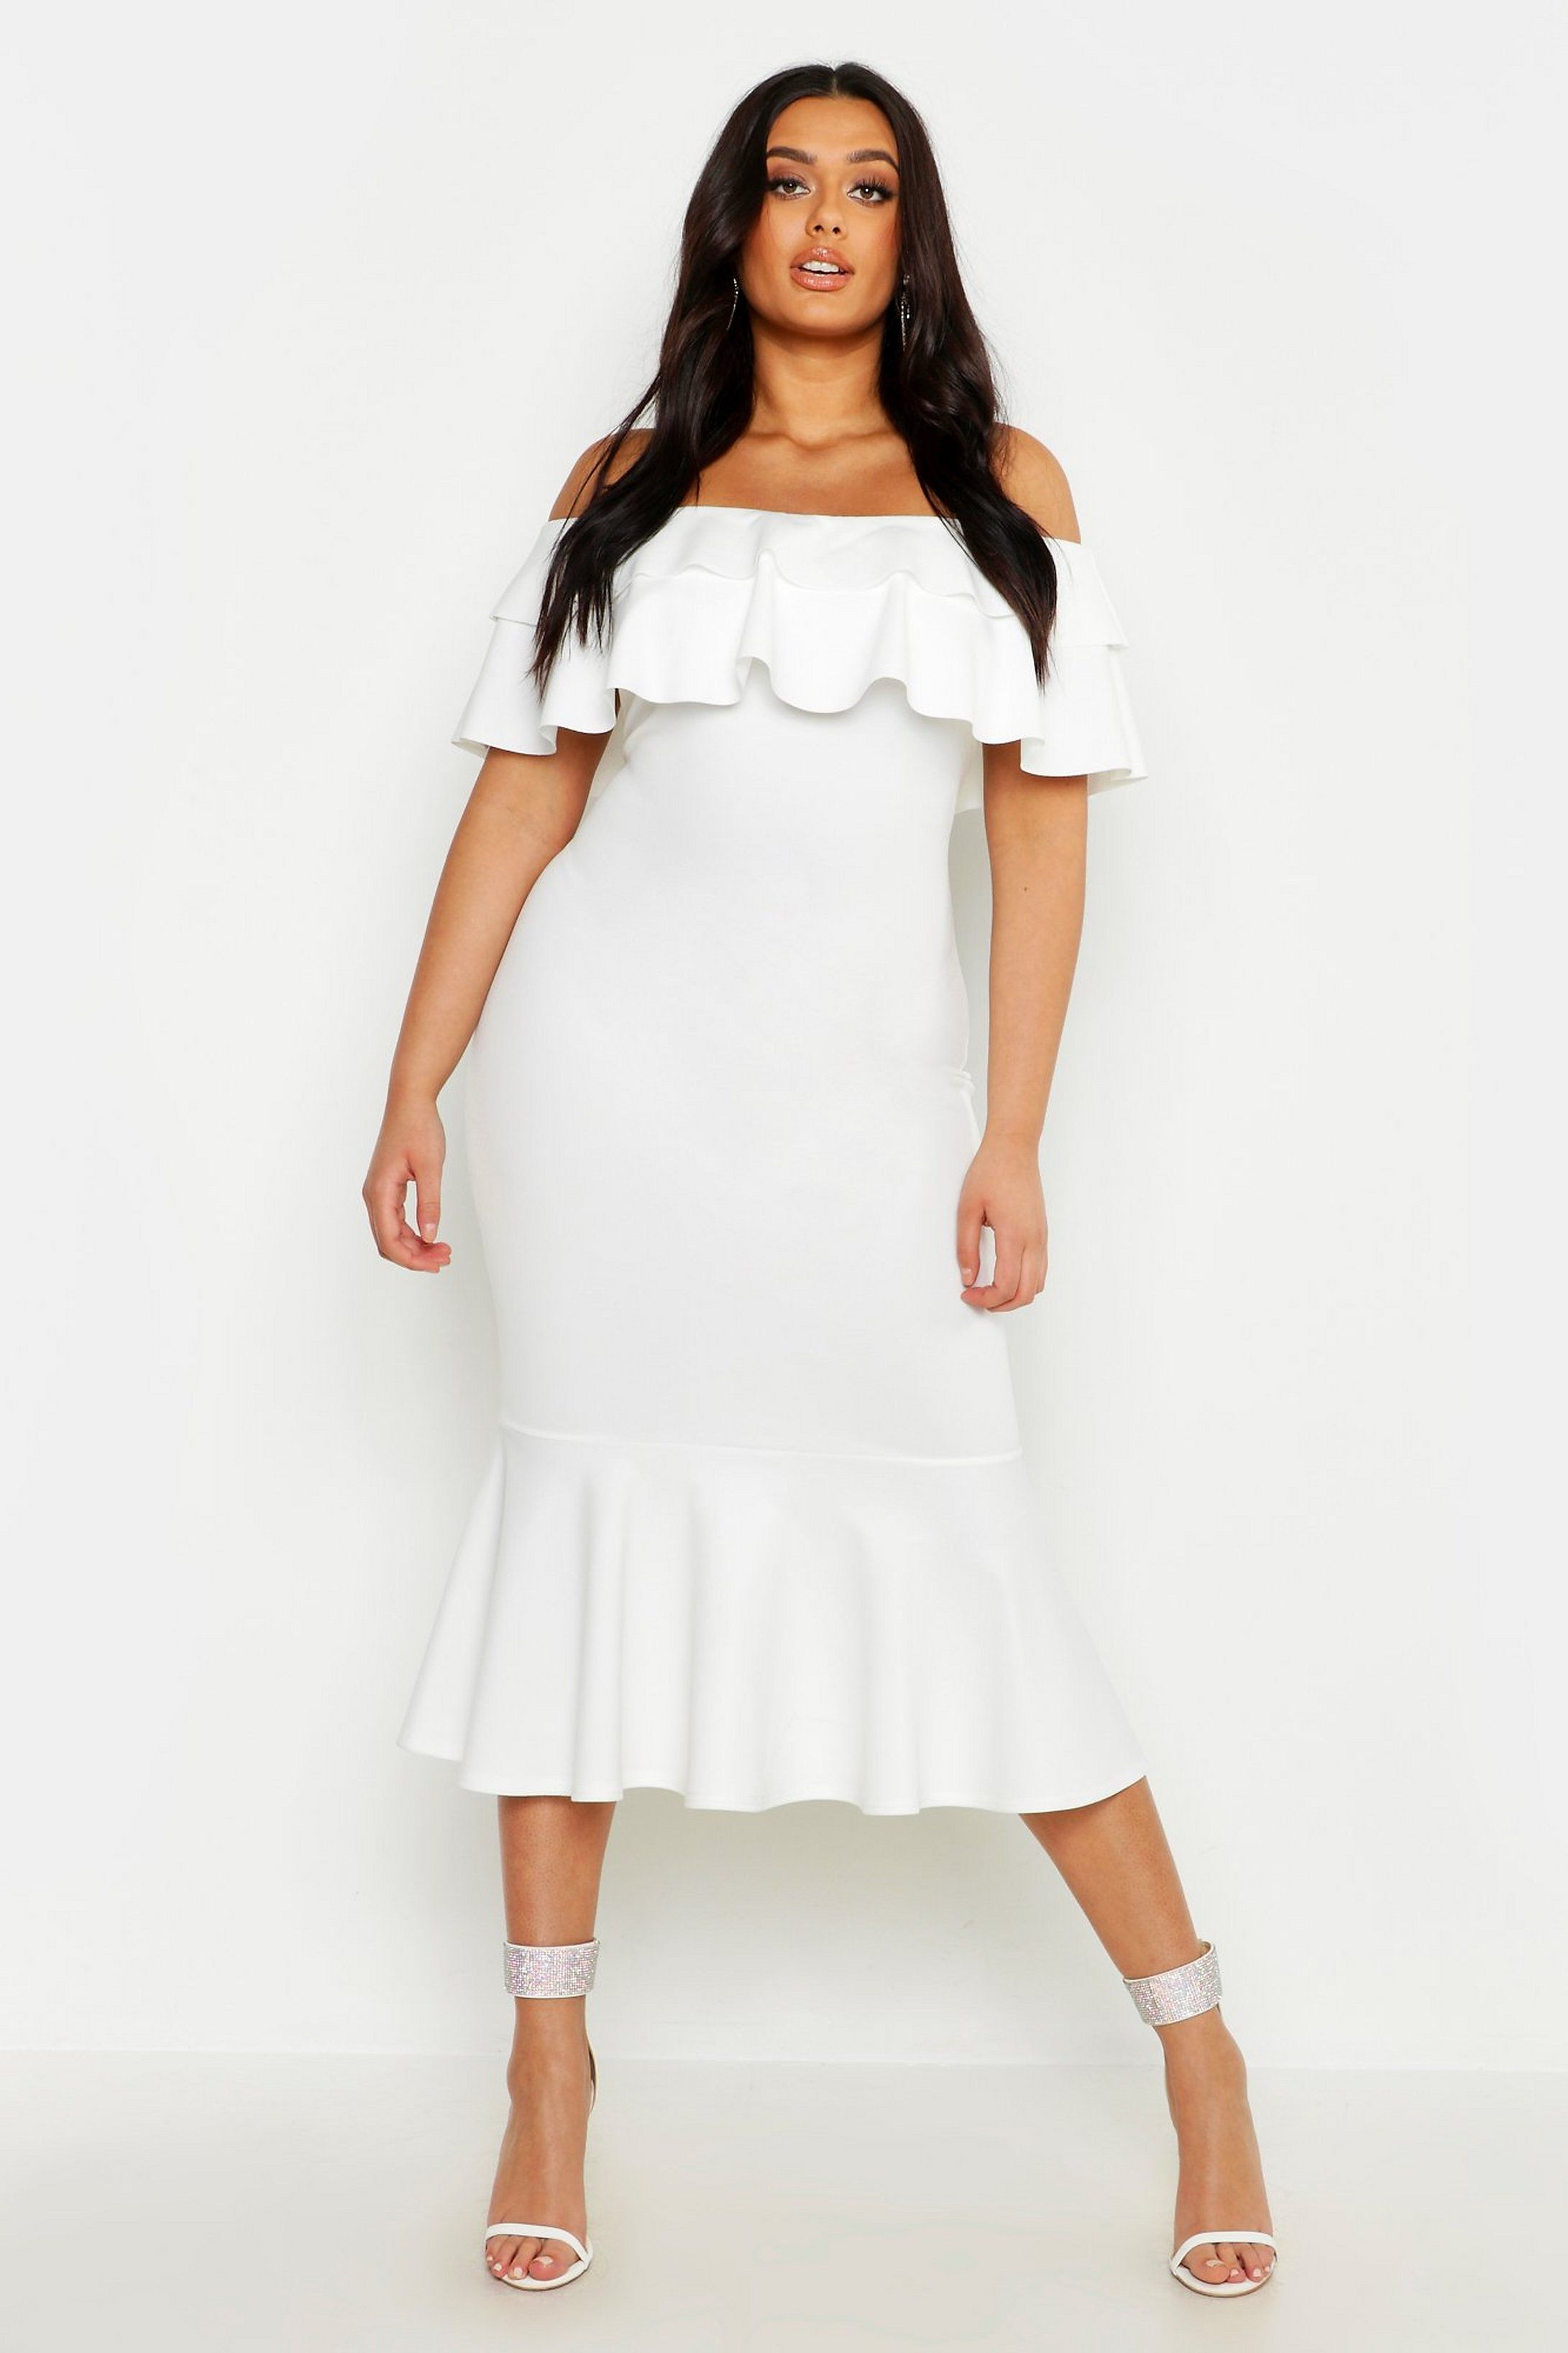 Plus Ruffle Fishtail Midi Dress Boohoo White Dress Party Stylish White Dress Fishtail Midi Dress [ 3273 x 2181 Pixel ]